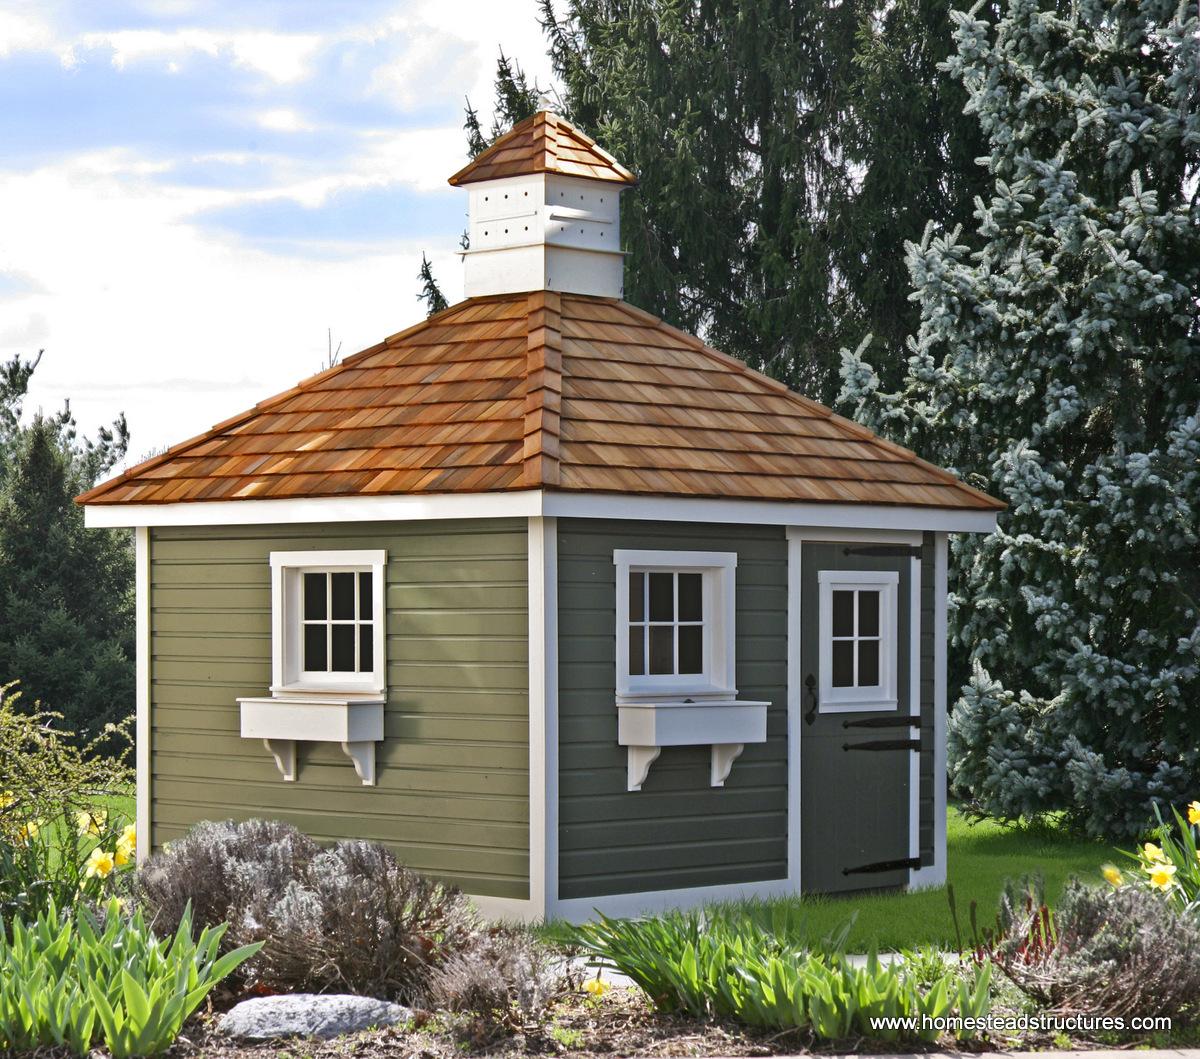 Garden Sheds York Pa garden sheds for garden storage, tool sheds | homestead structures